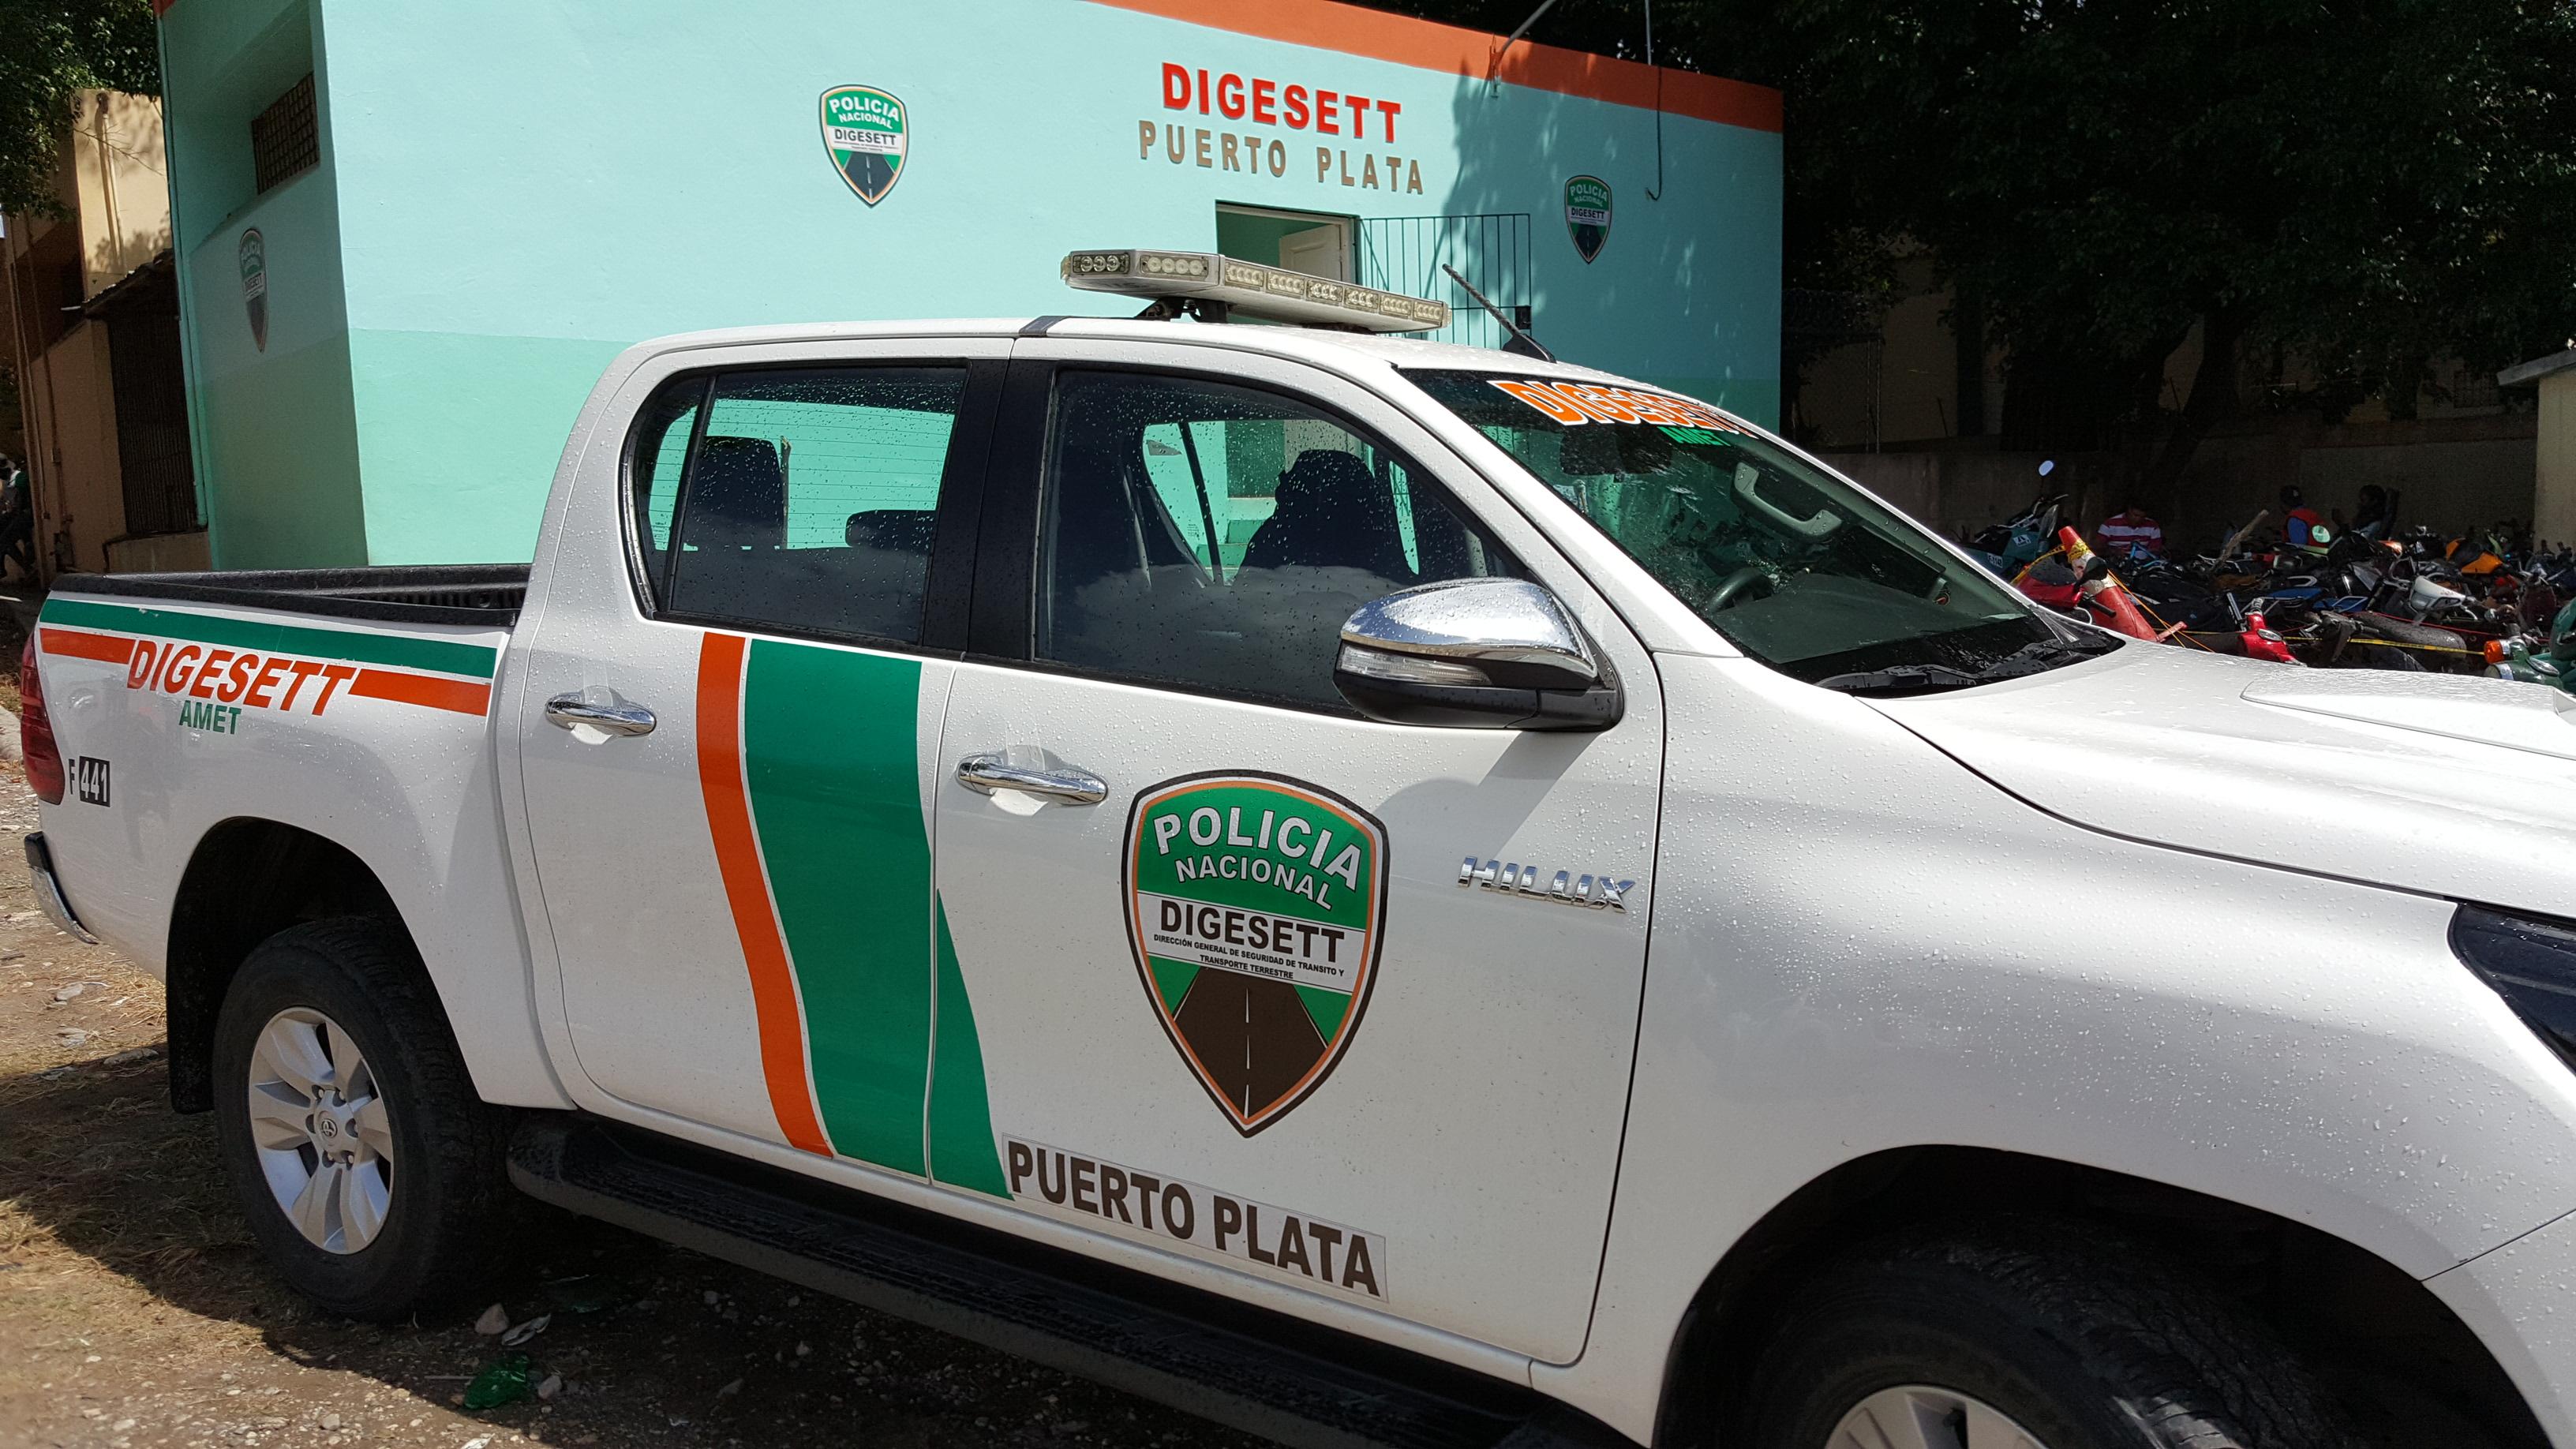 Digesett designa nuevo comandante en Puerto Plata